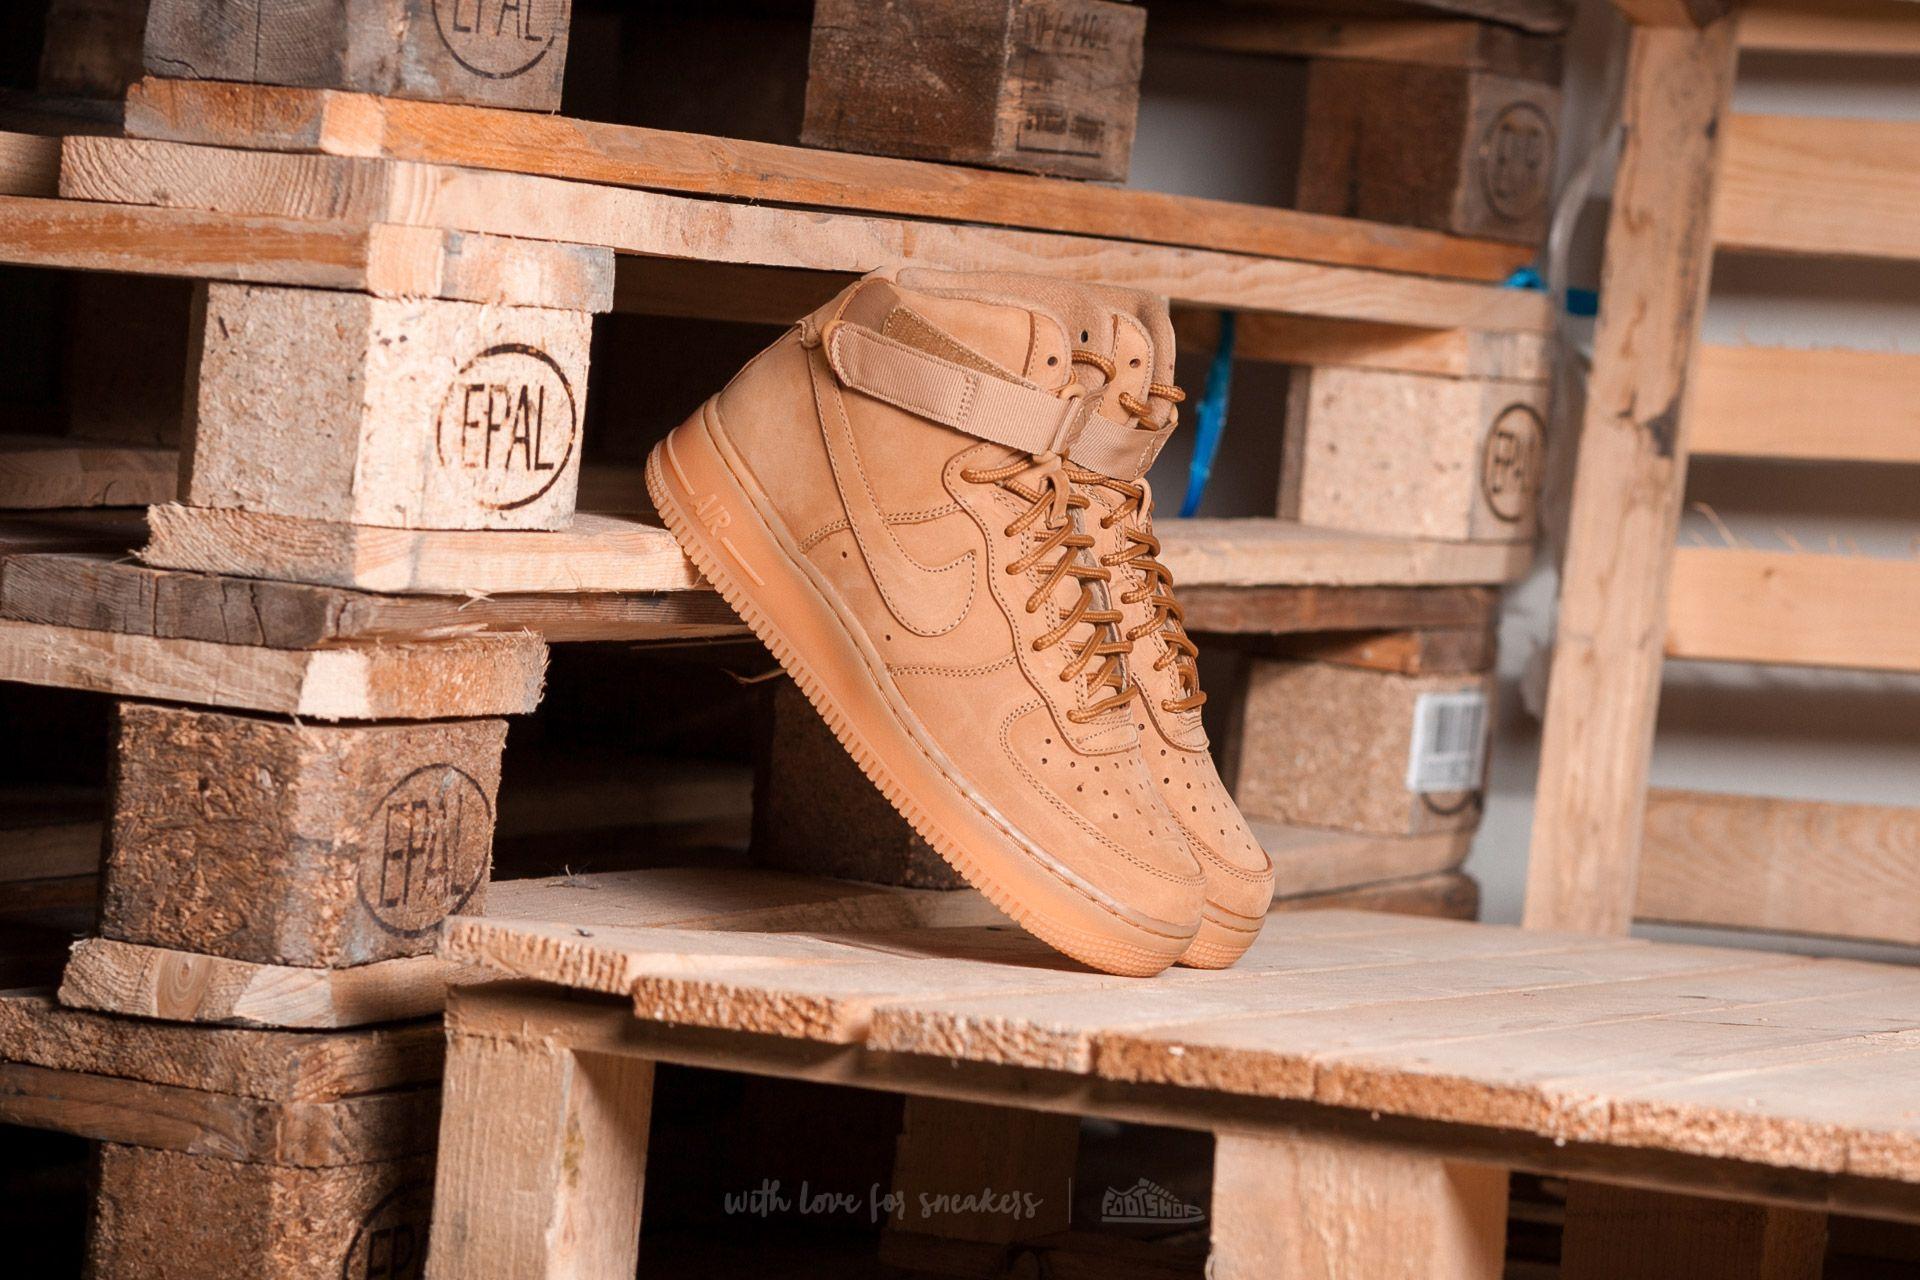 Nike Air Force 1 High LV8 (GS) Flax/ Flax-Outdoor Green